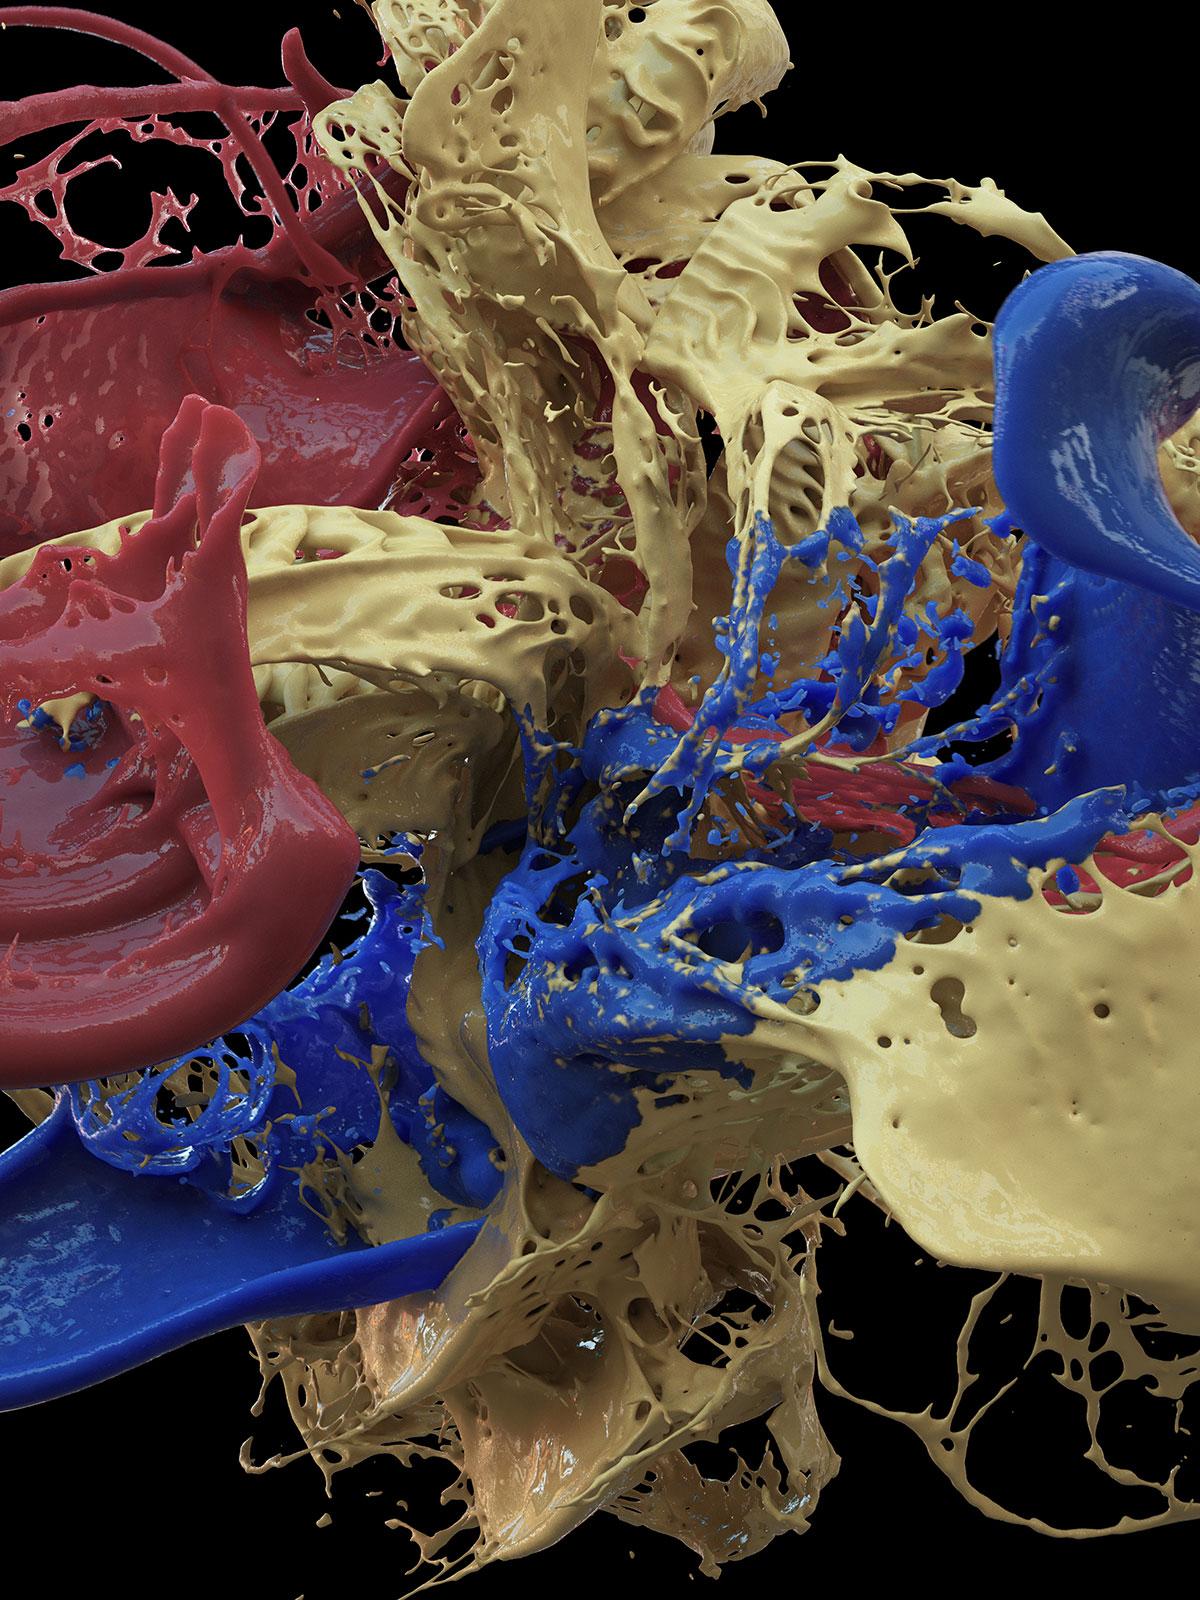 Postpainting II 02, CGI Fine Art Print, 160 x 120 cm, 2013